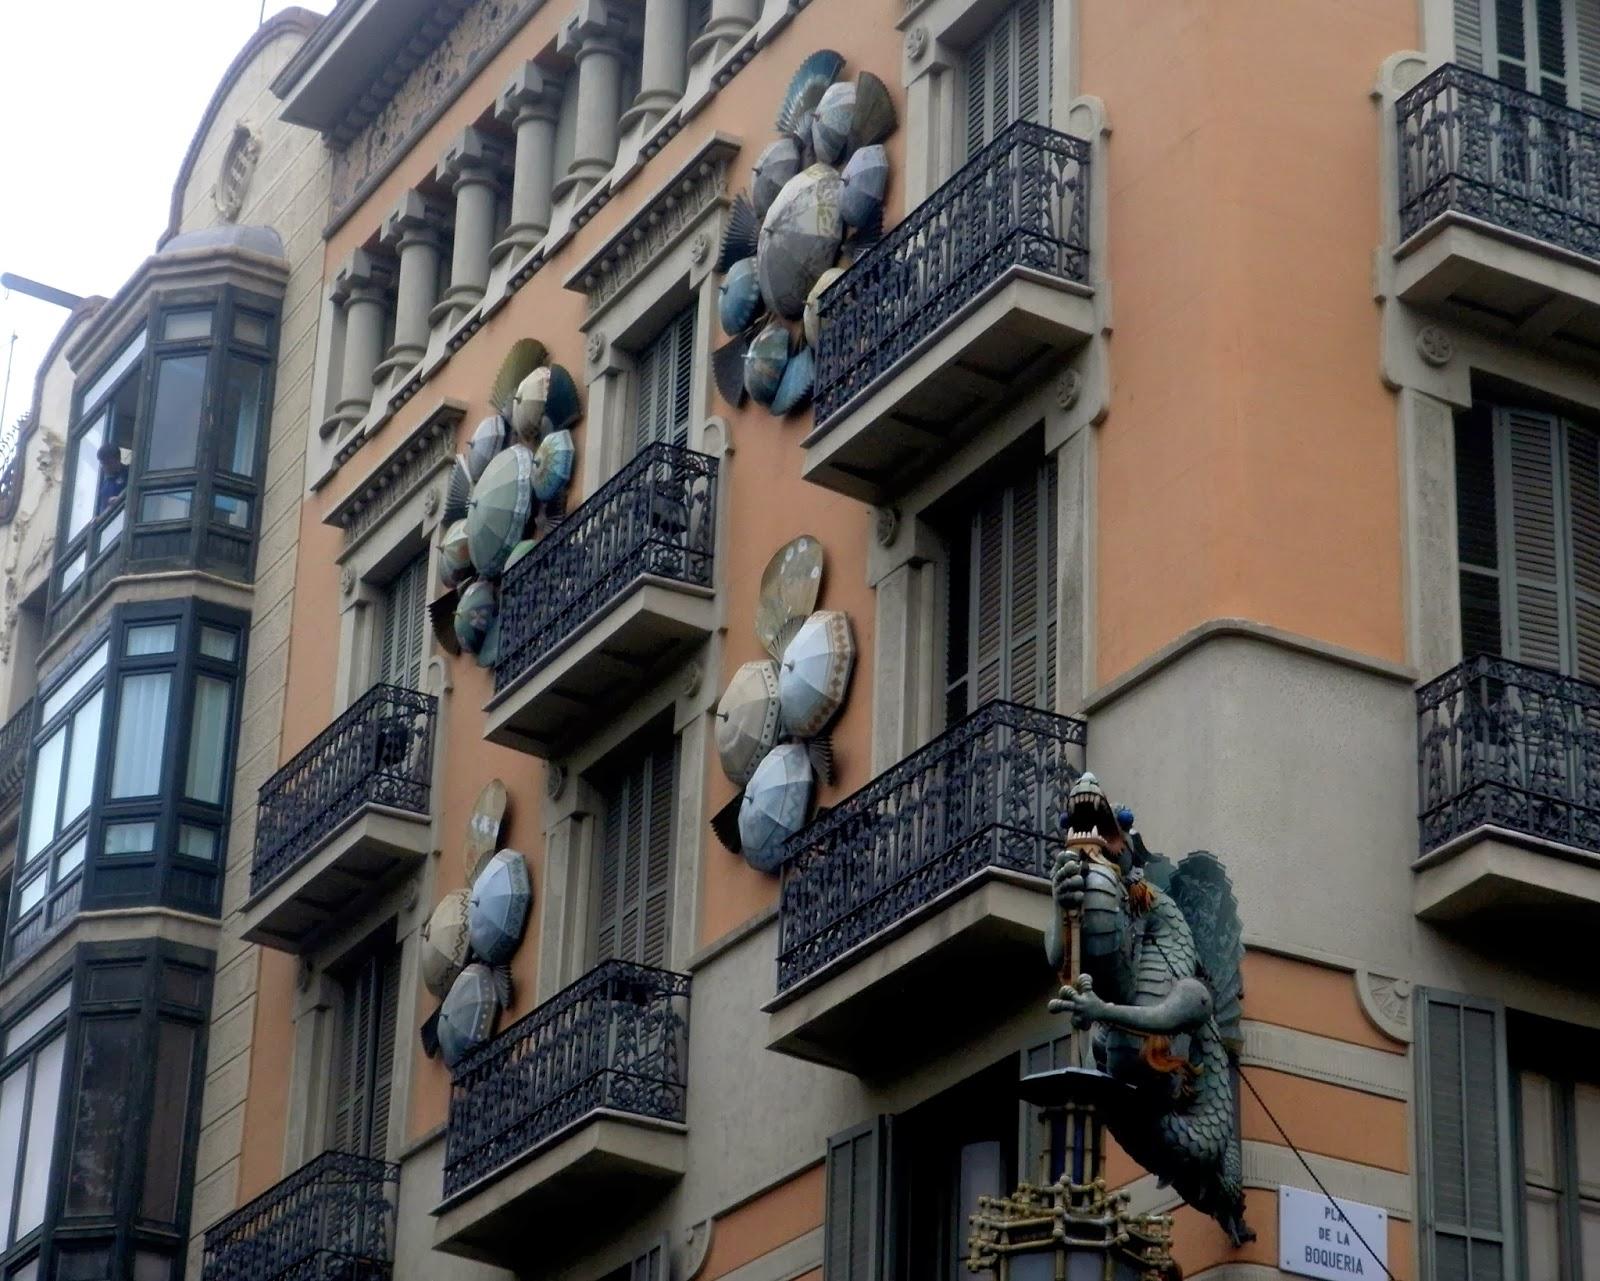 Barcelona la ciutat vella ando y reando - Calle boqueria barcelona ...